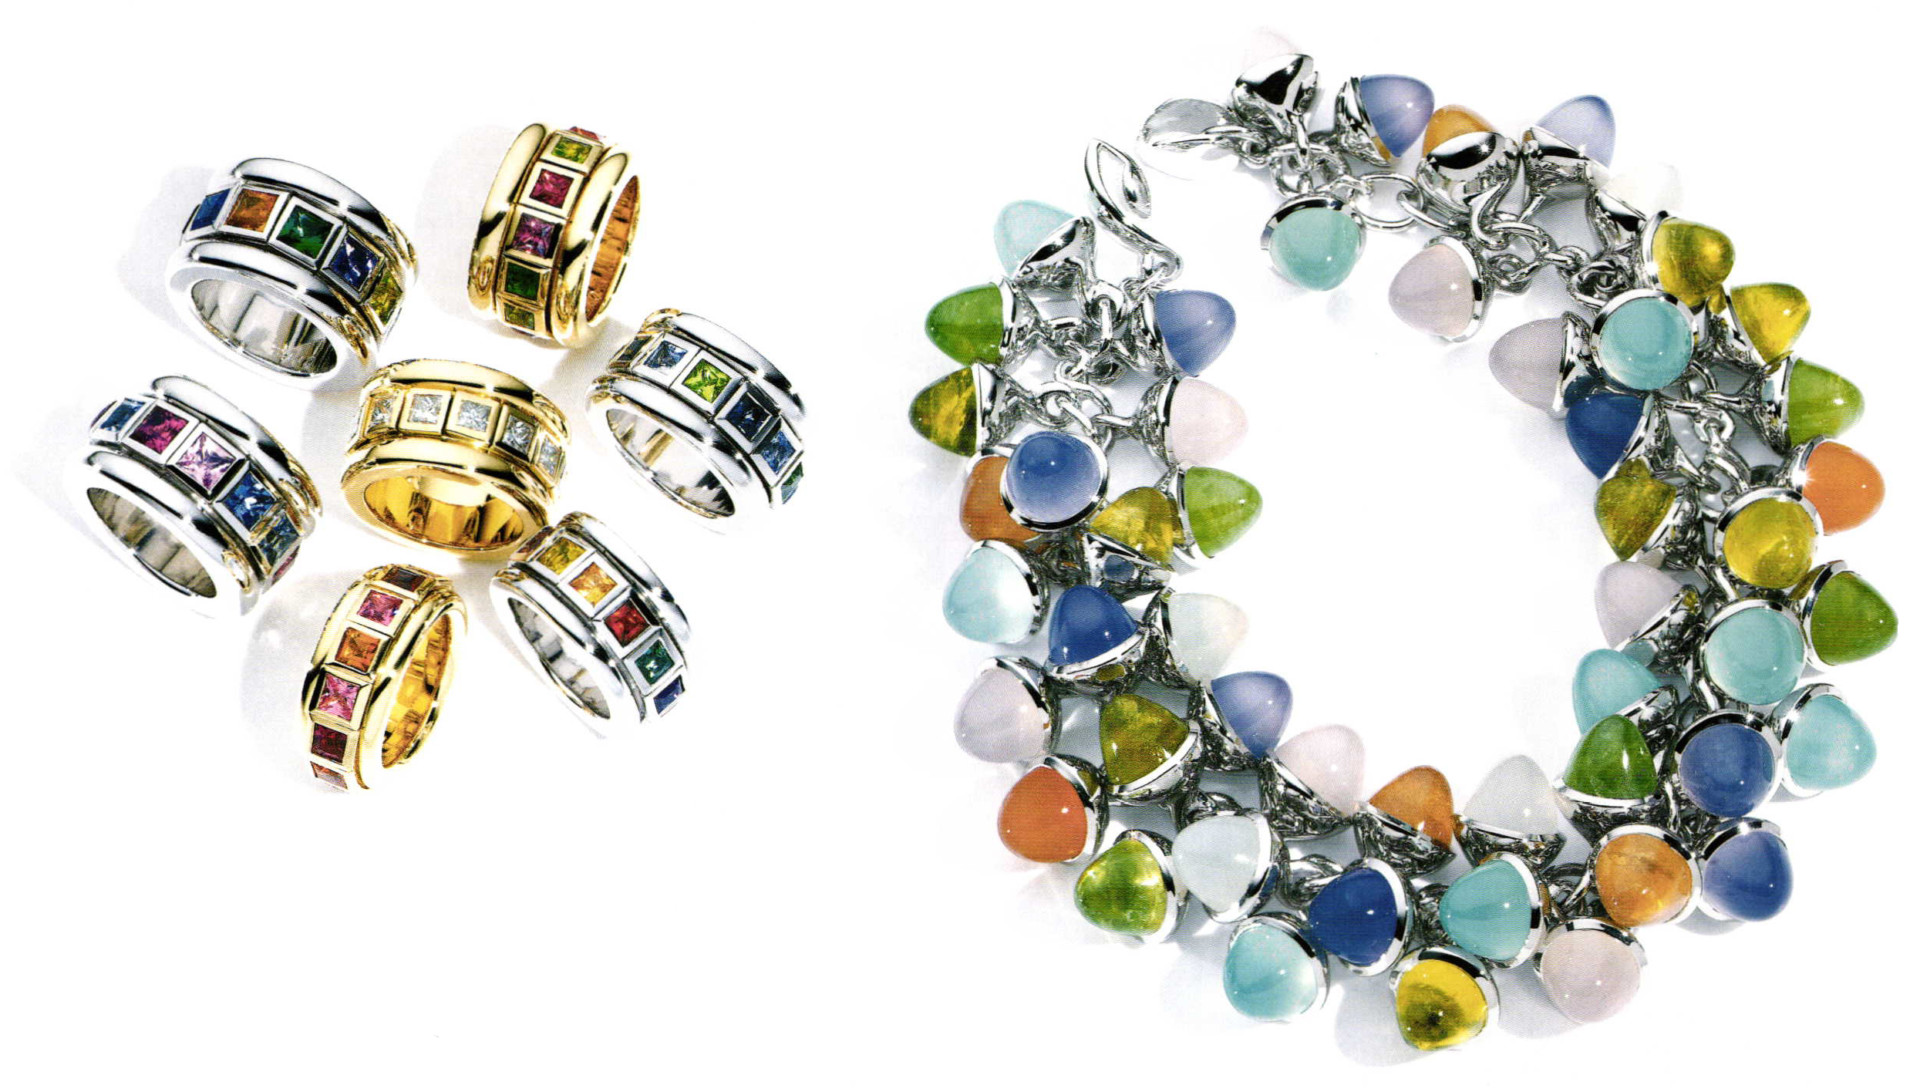 World Largest Jewelry Exchange New York Style Guru